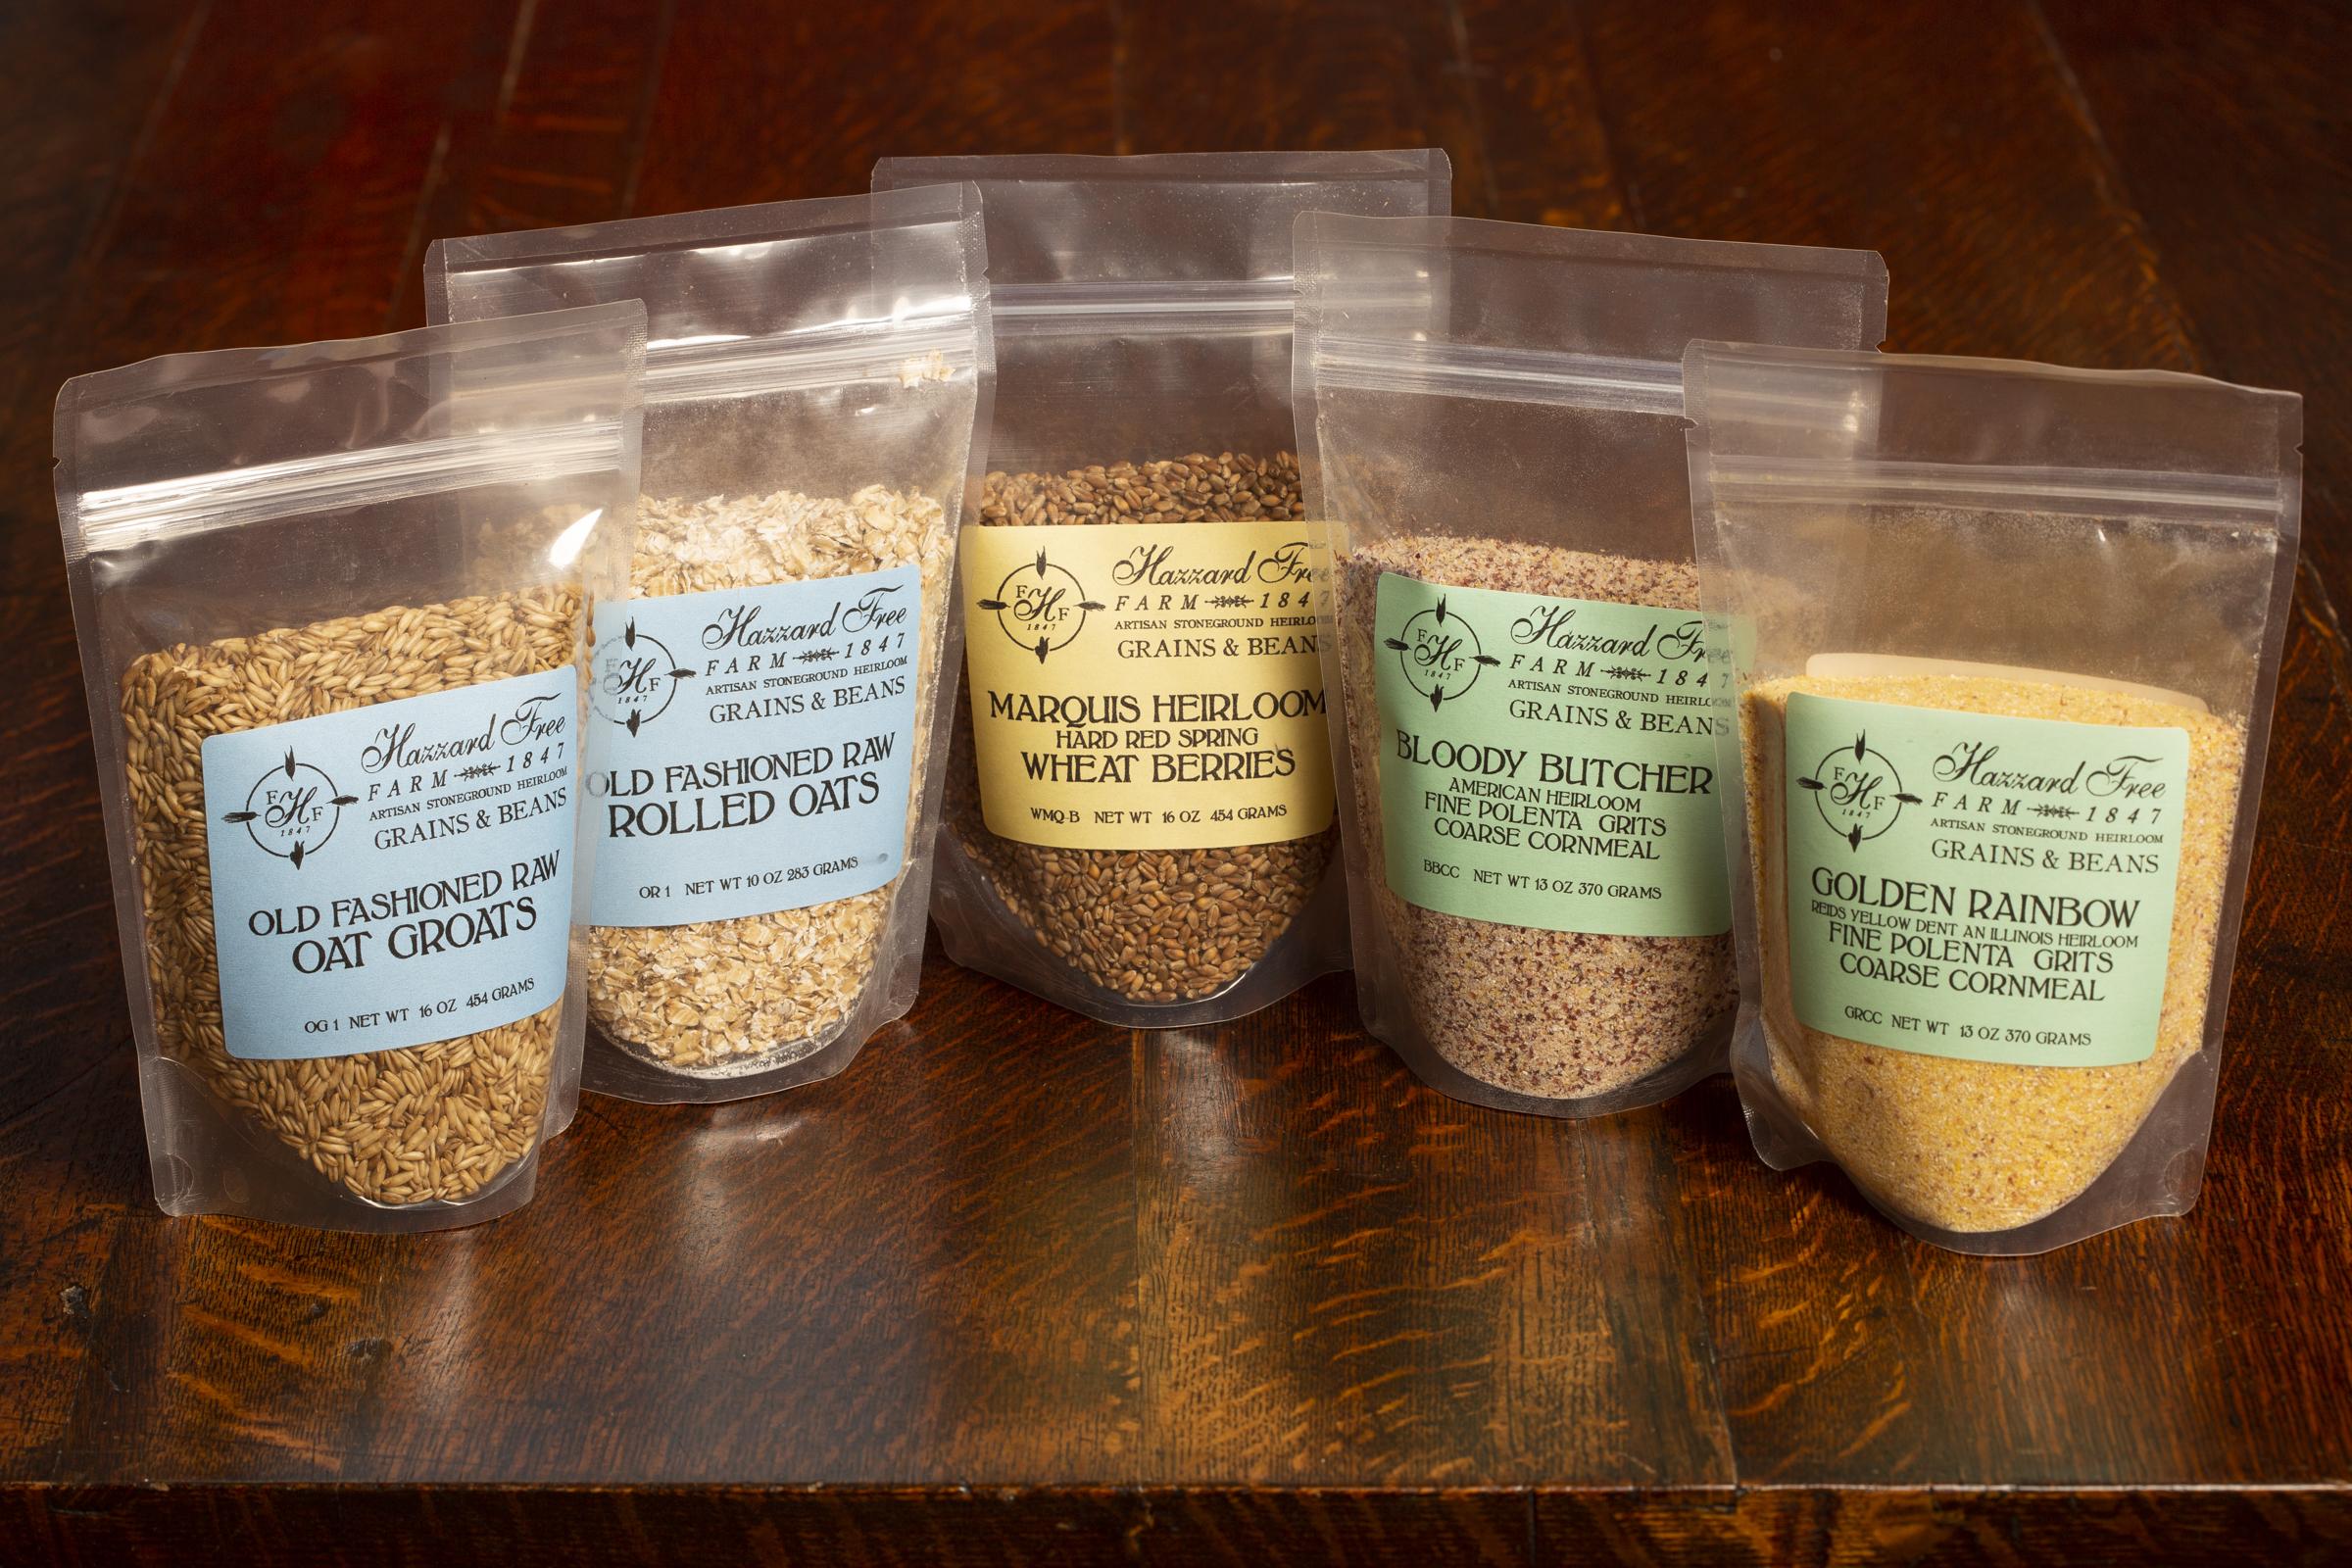 Hazzard Free Farms Cooks Box